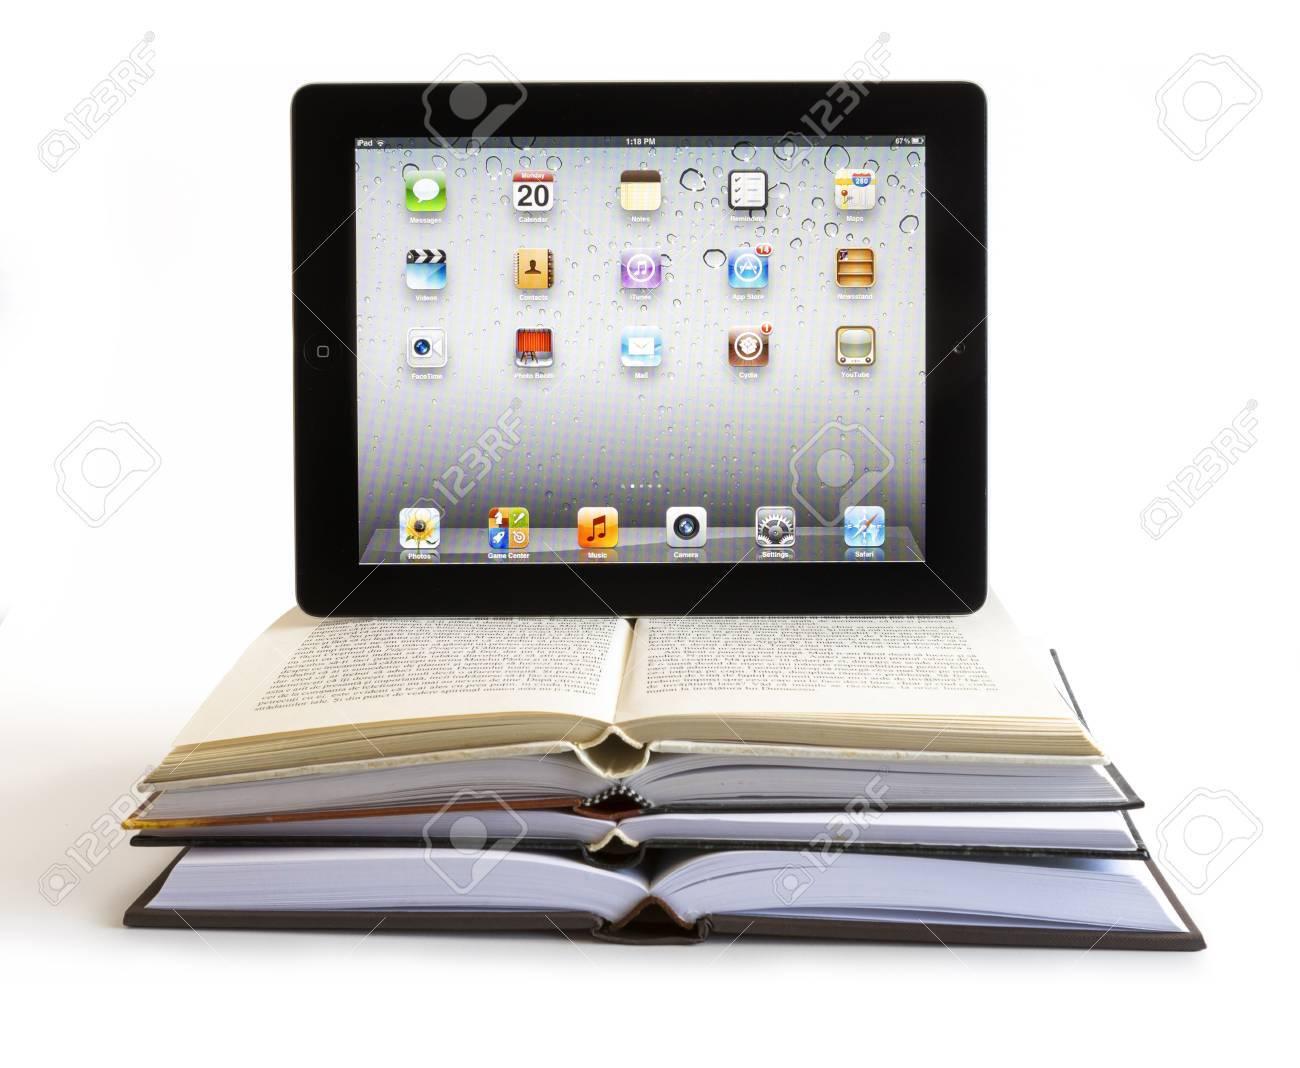 iPad 3 boasts a stunning retina display, a beefed up A5X dual-core processor, quad-core graphics. Studio shot on white background. - 18144565